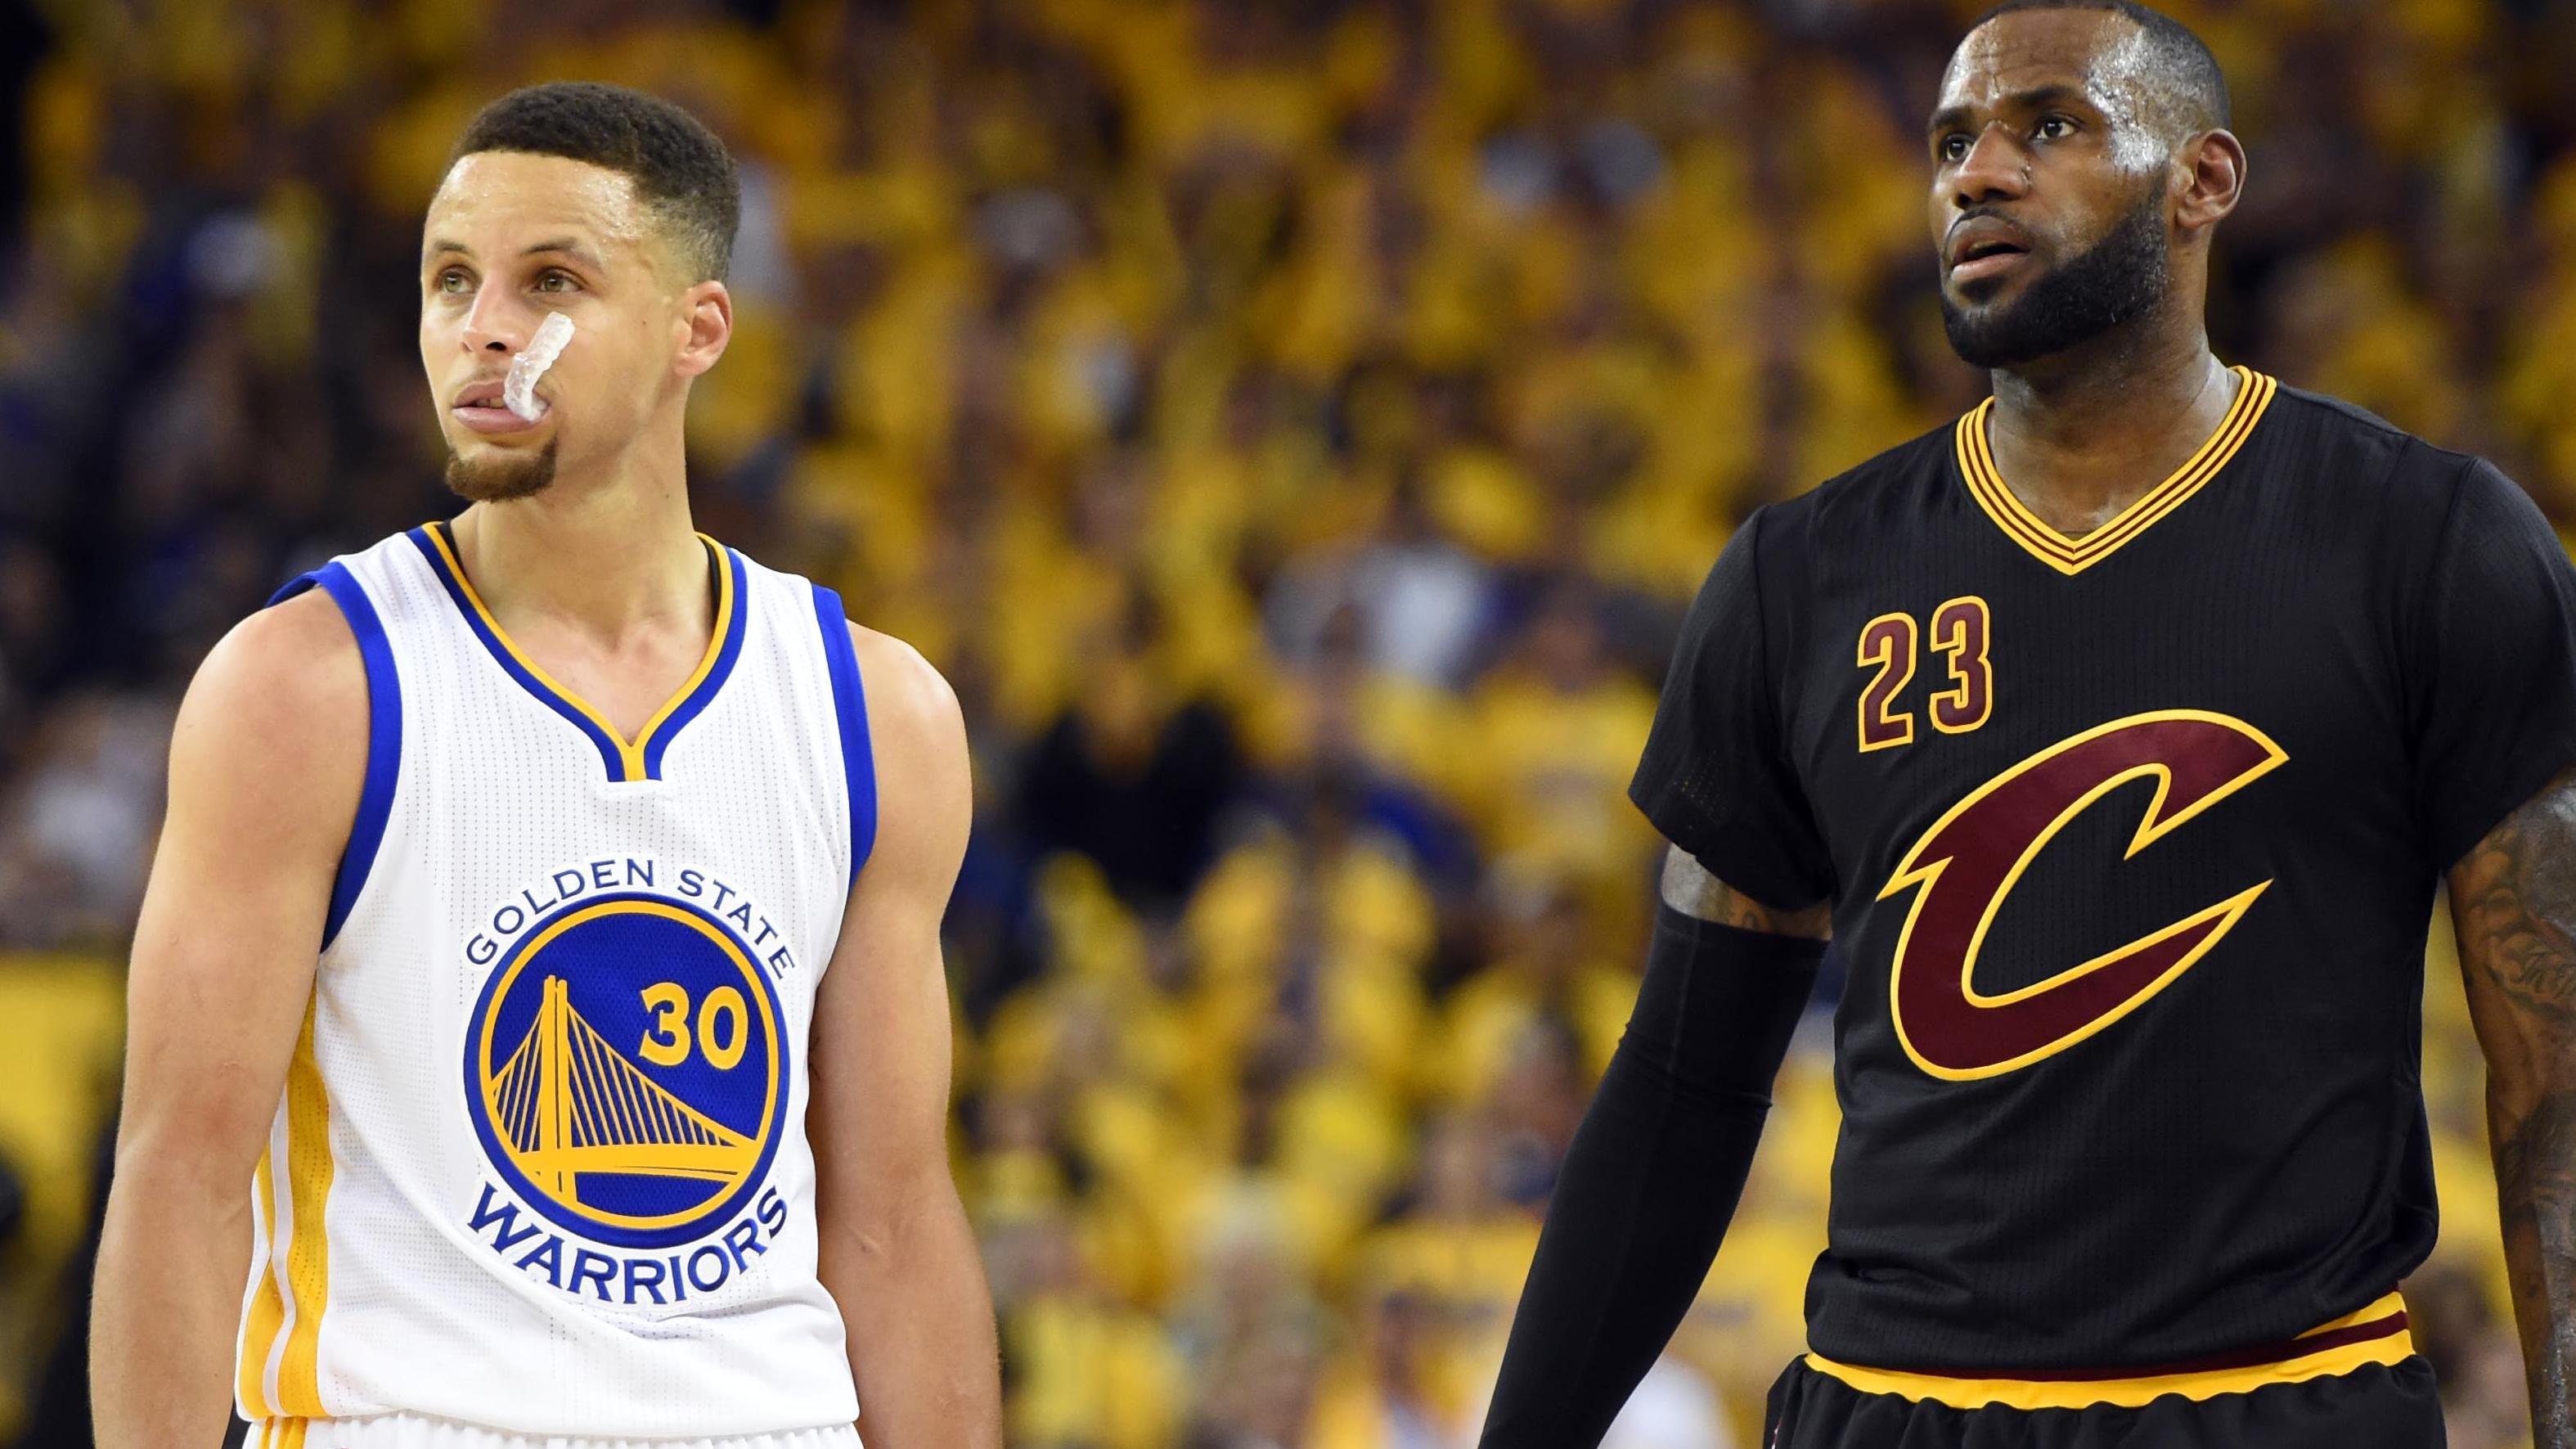 2018 NBA Finali ne zaman? | Golden State Warriors Cleveland Cavaliers finali ne zaman, saat kaçta, hangi kanalda?